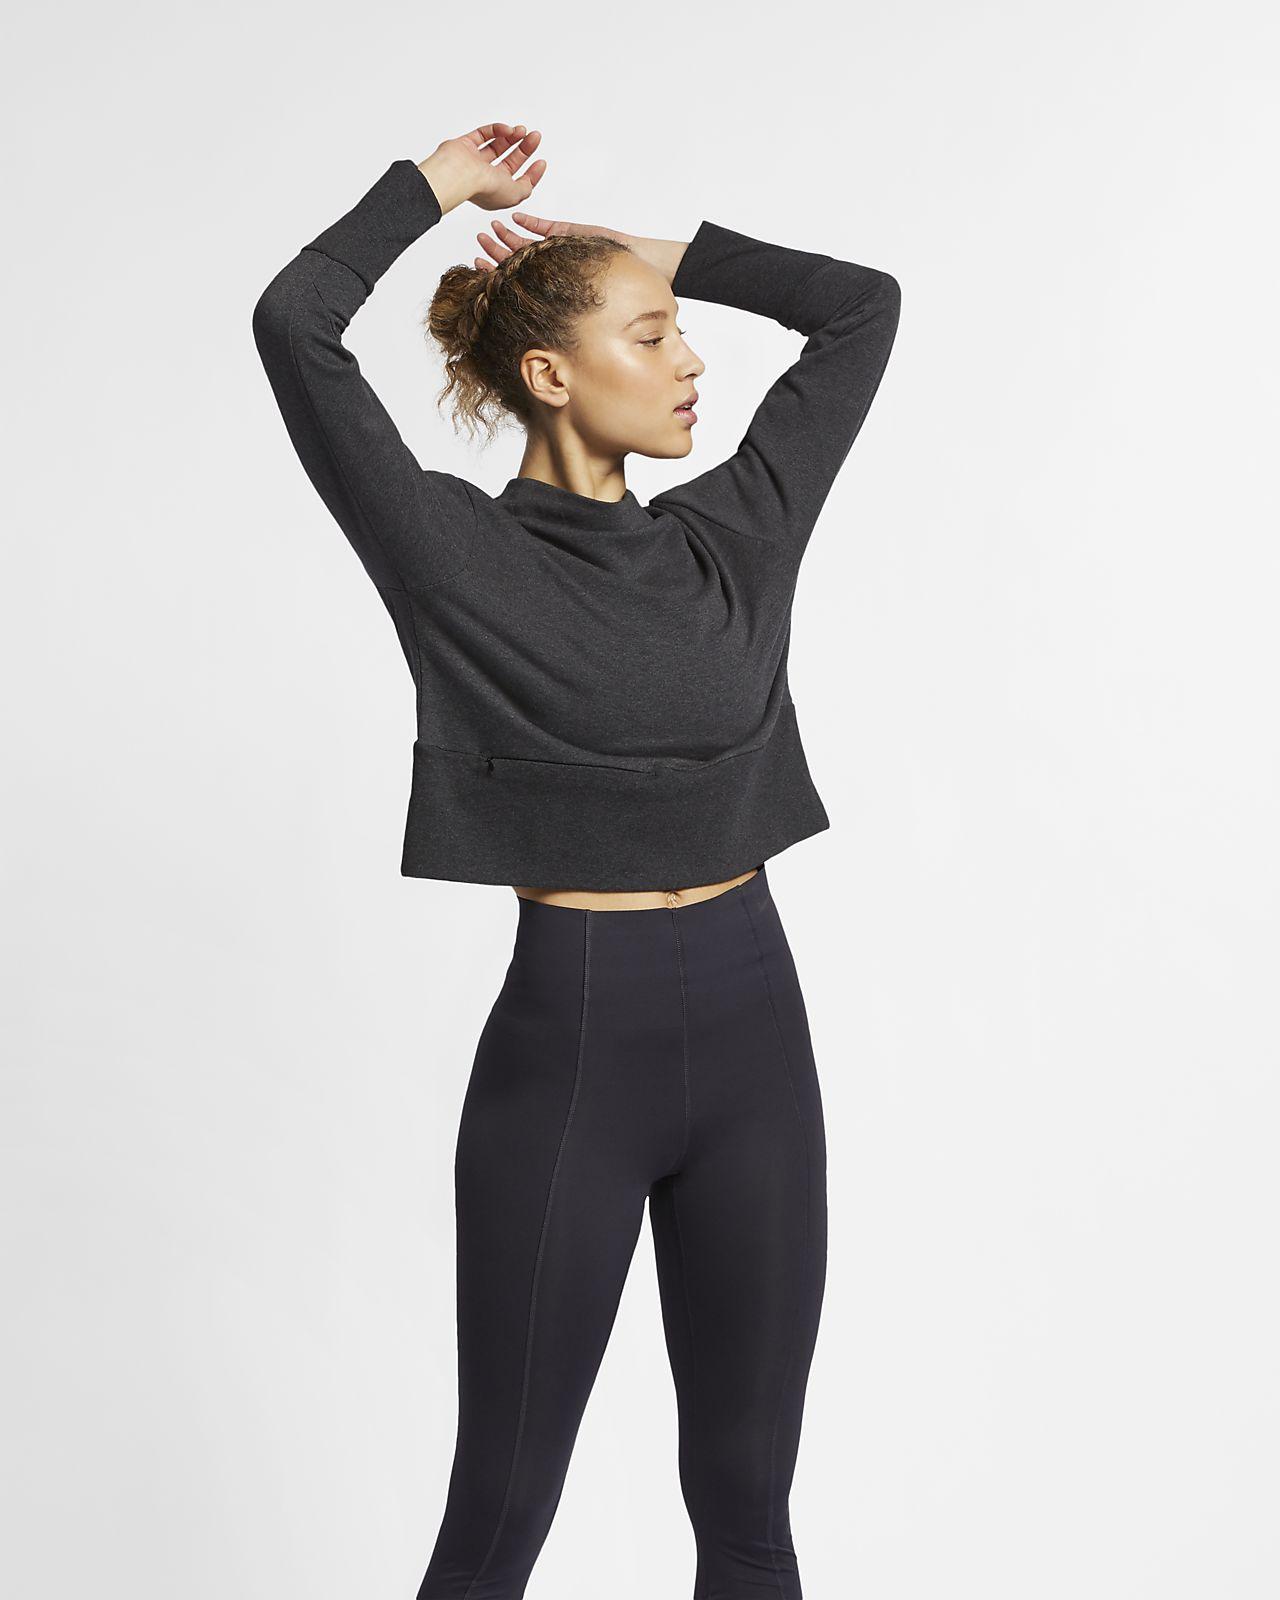 Nike Studio Women's Yoga Training Pullover Top